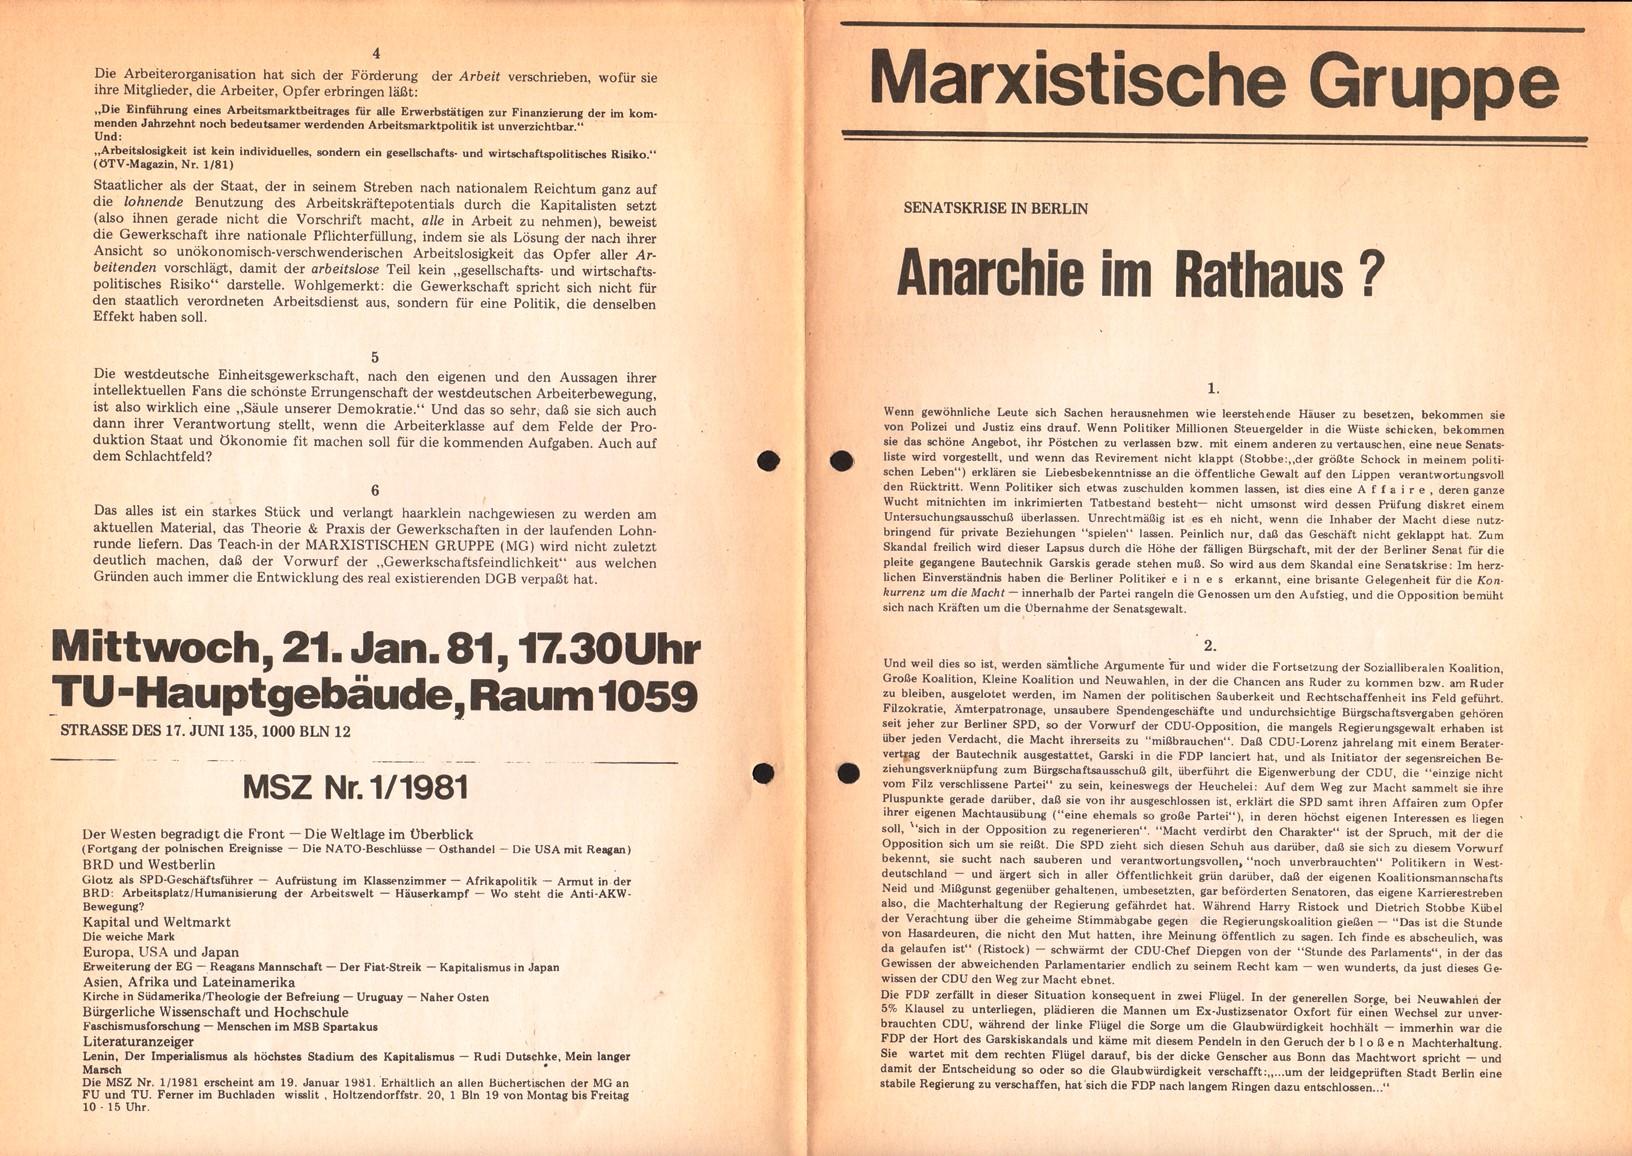 Berlin_MG_FB_19810115_01